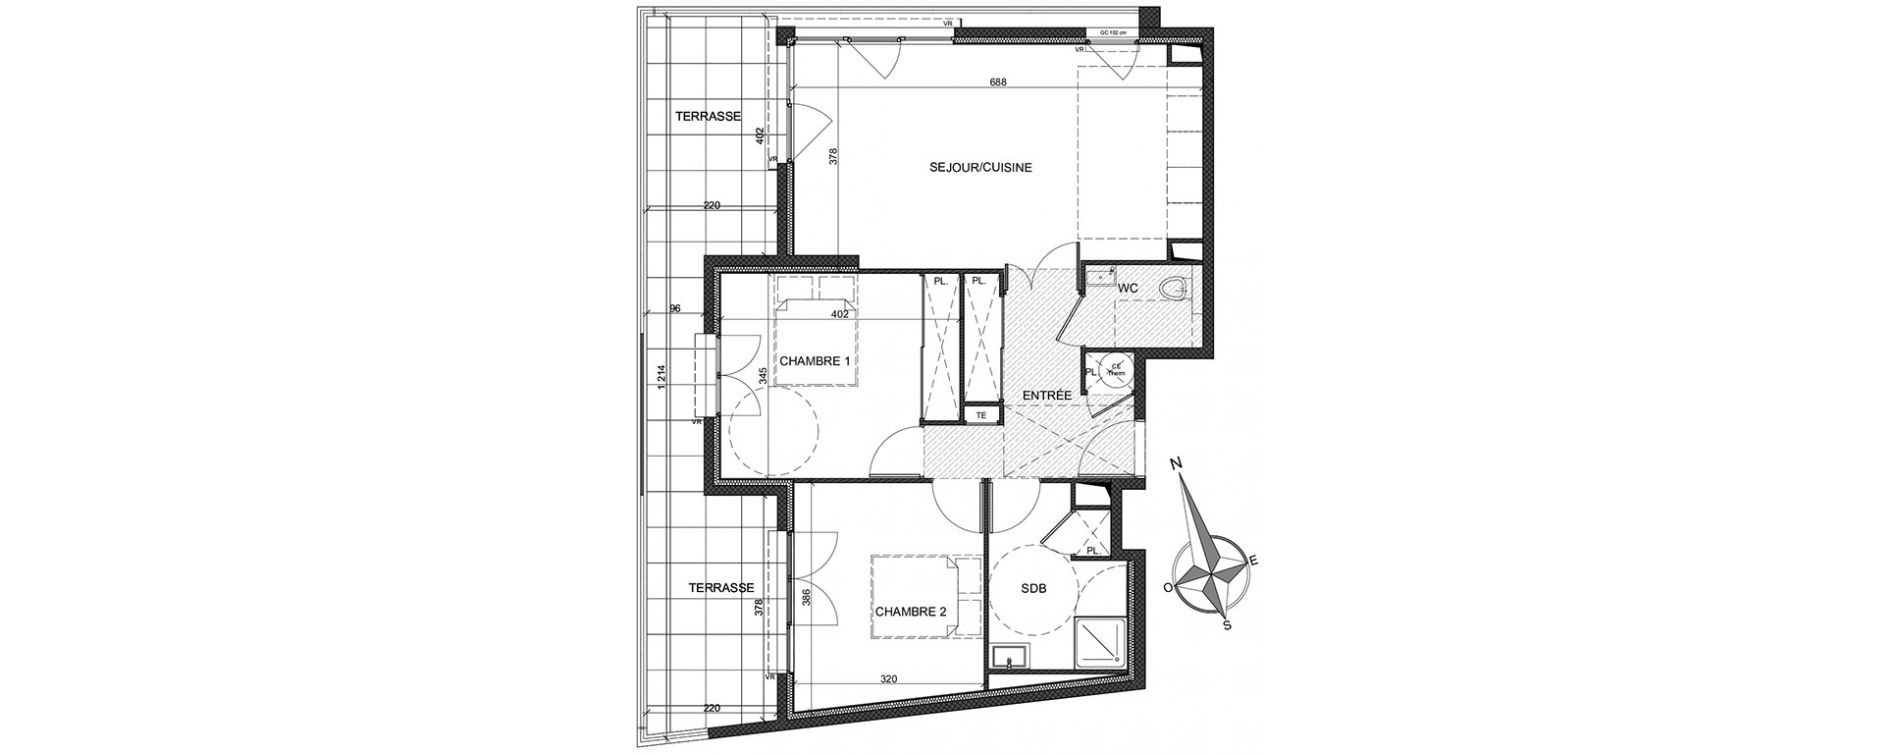 Appartement T3 de 68,37 m2 à Antibes Antibes coeur de ville